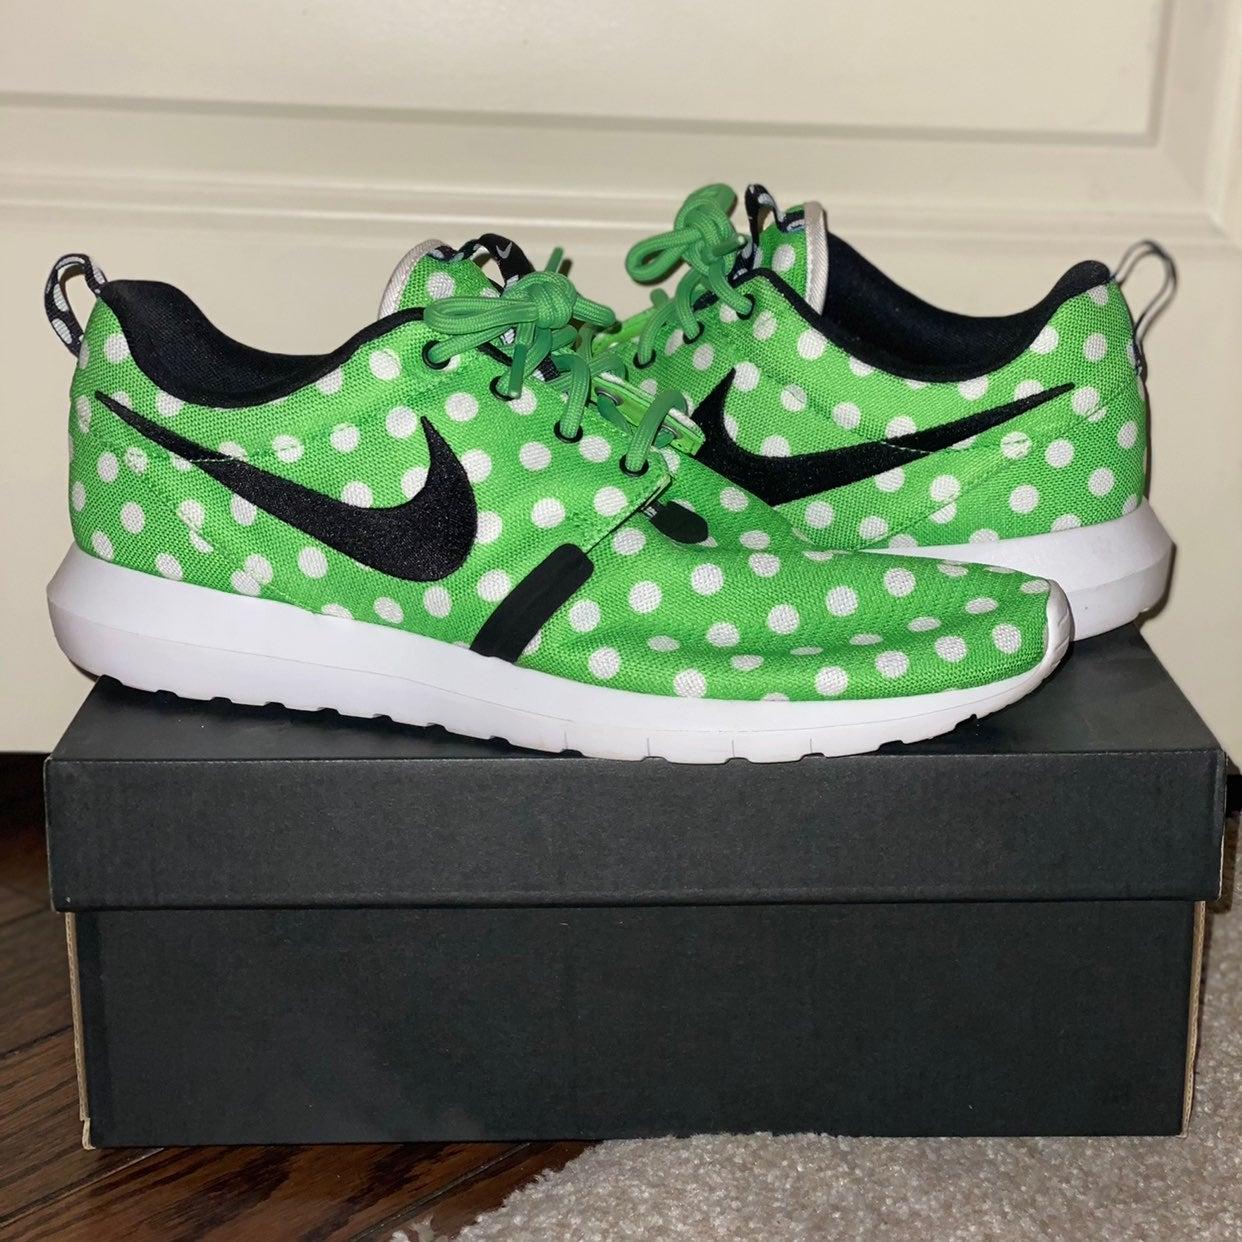 Nike Roshe Run Polka Dot Pack Green